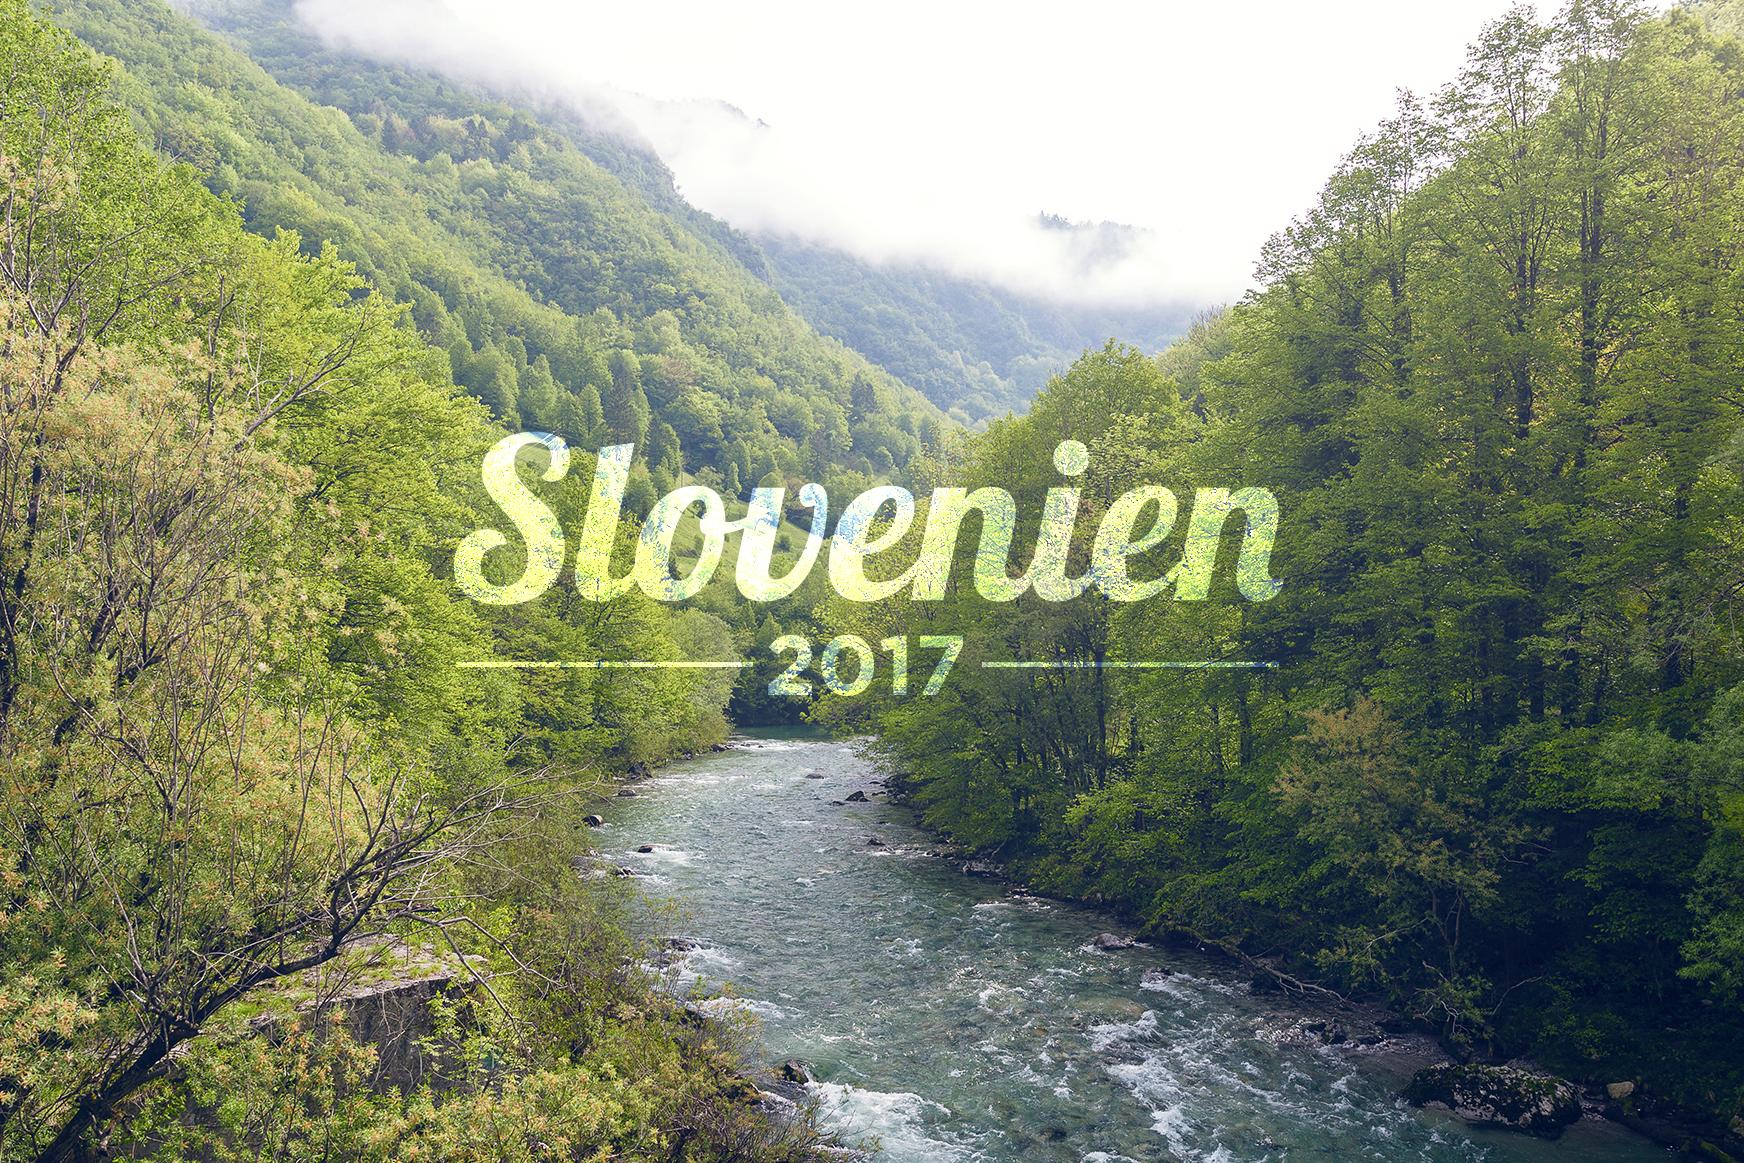 Slovenien_2017.jpg